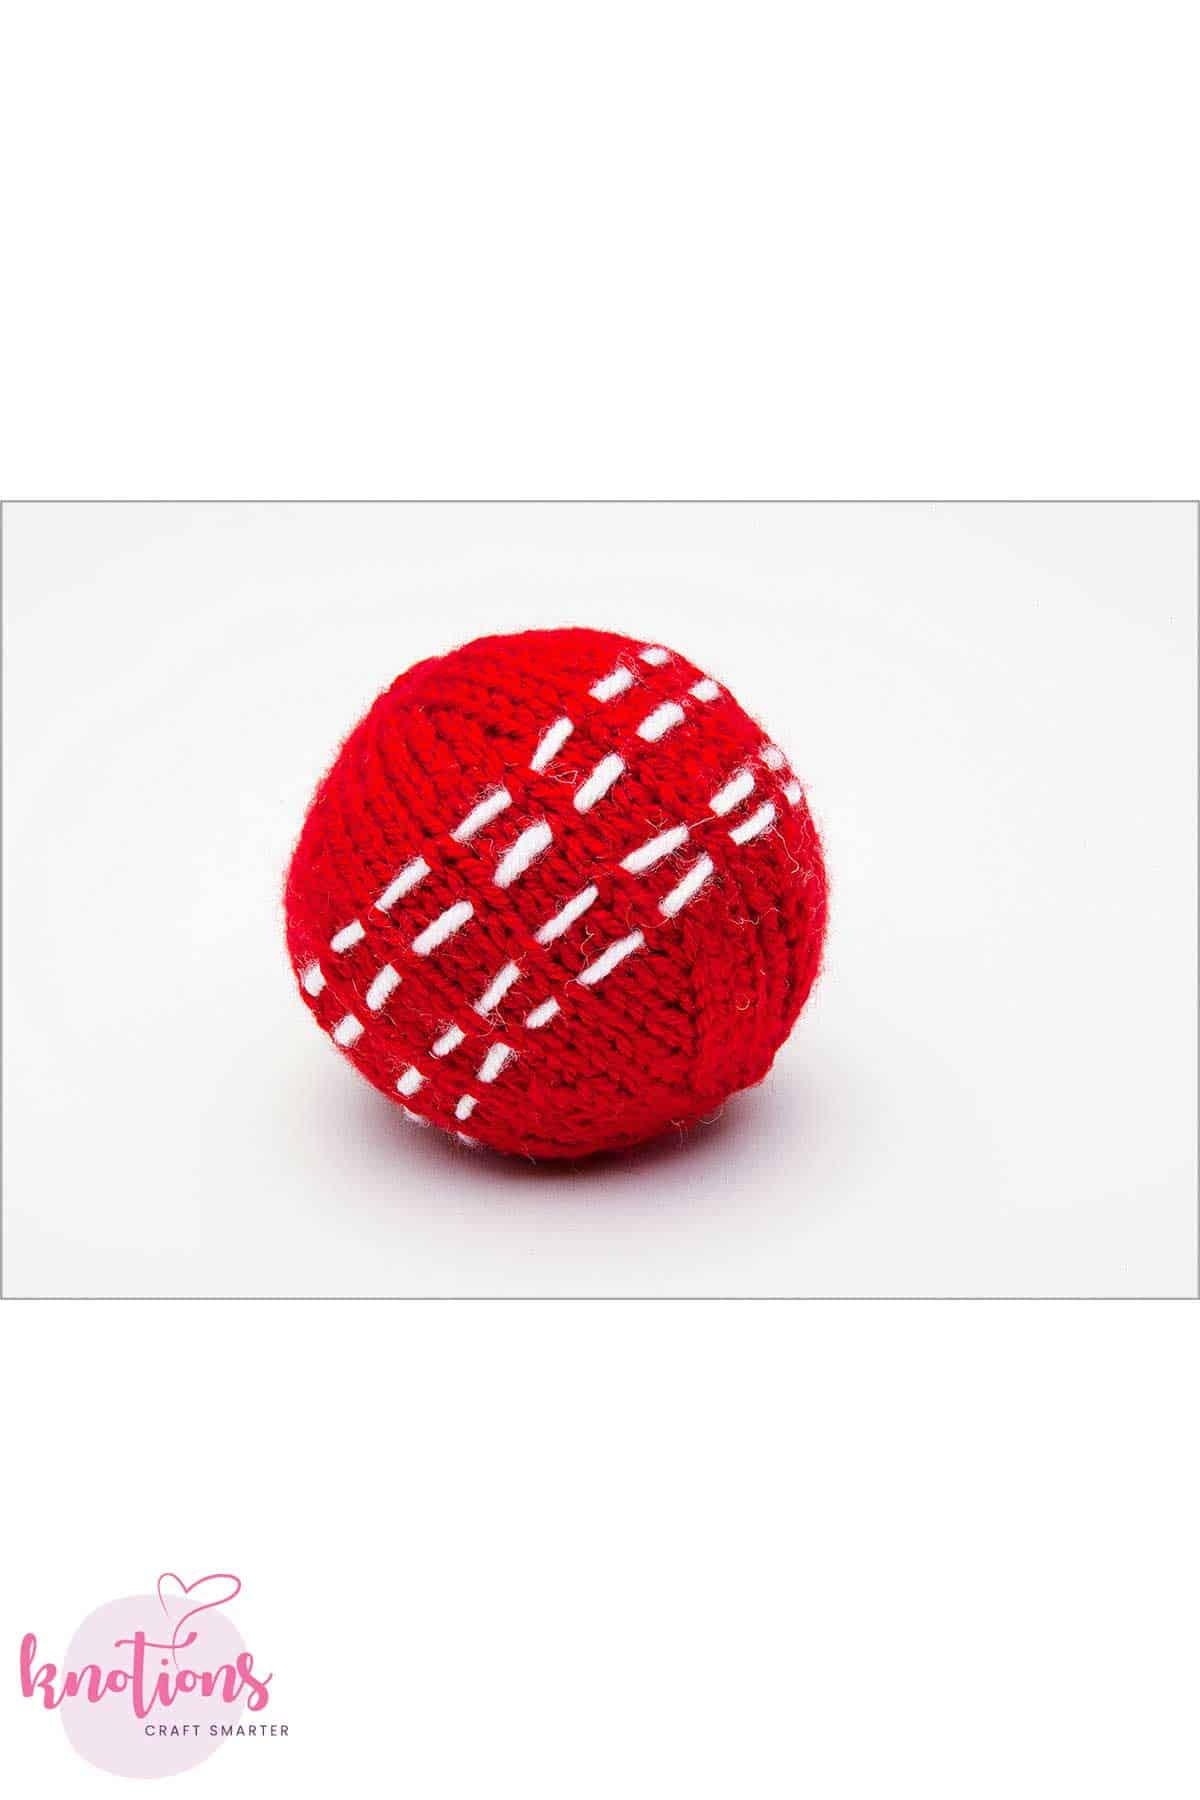 baseball-cricketball-7